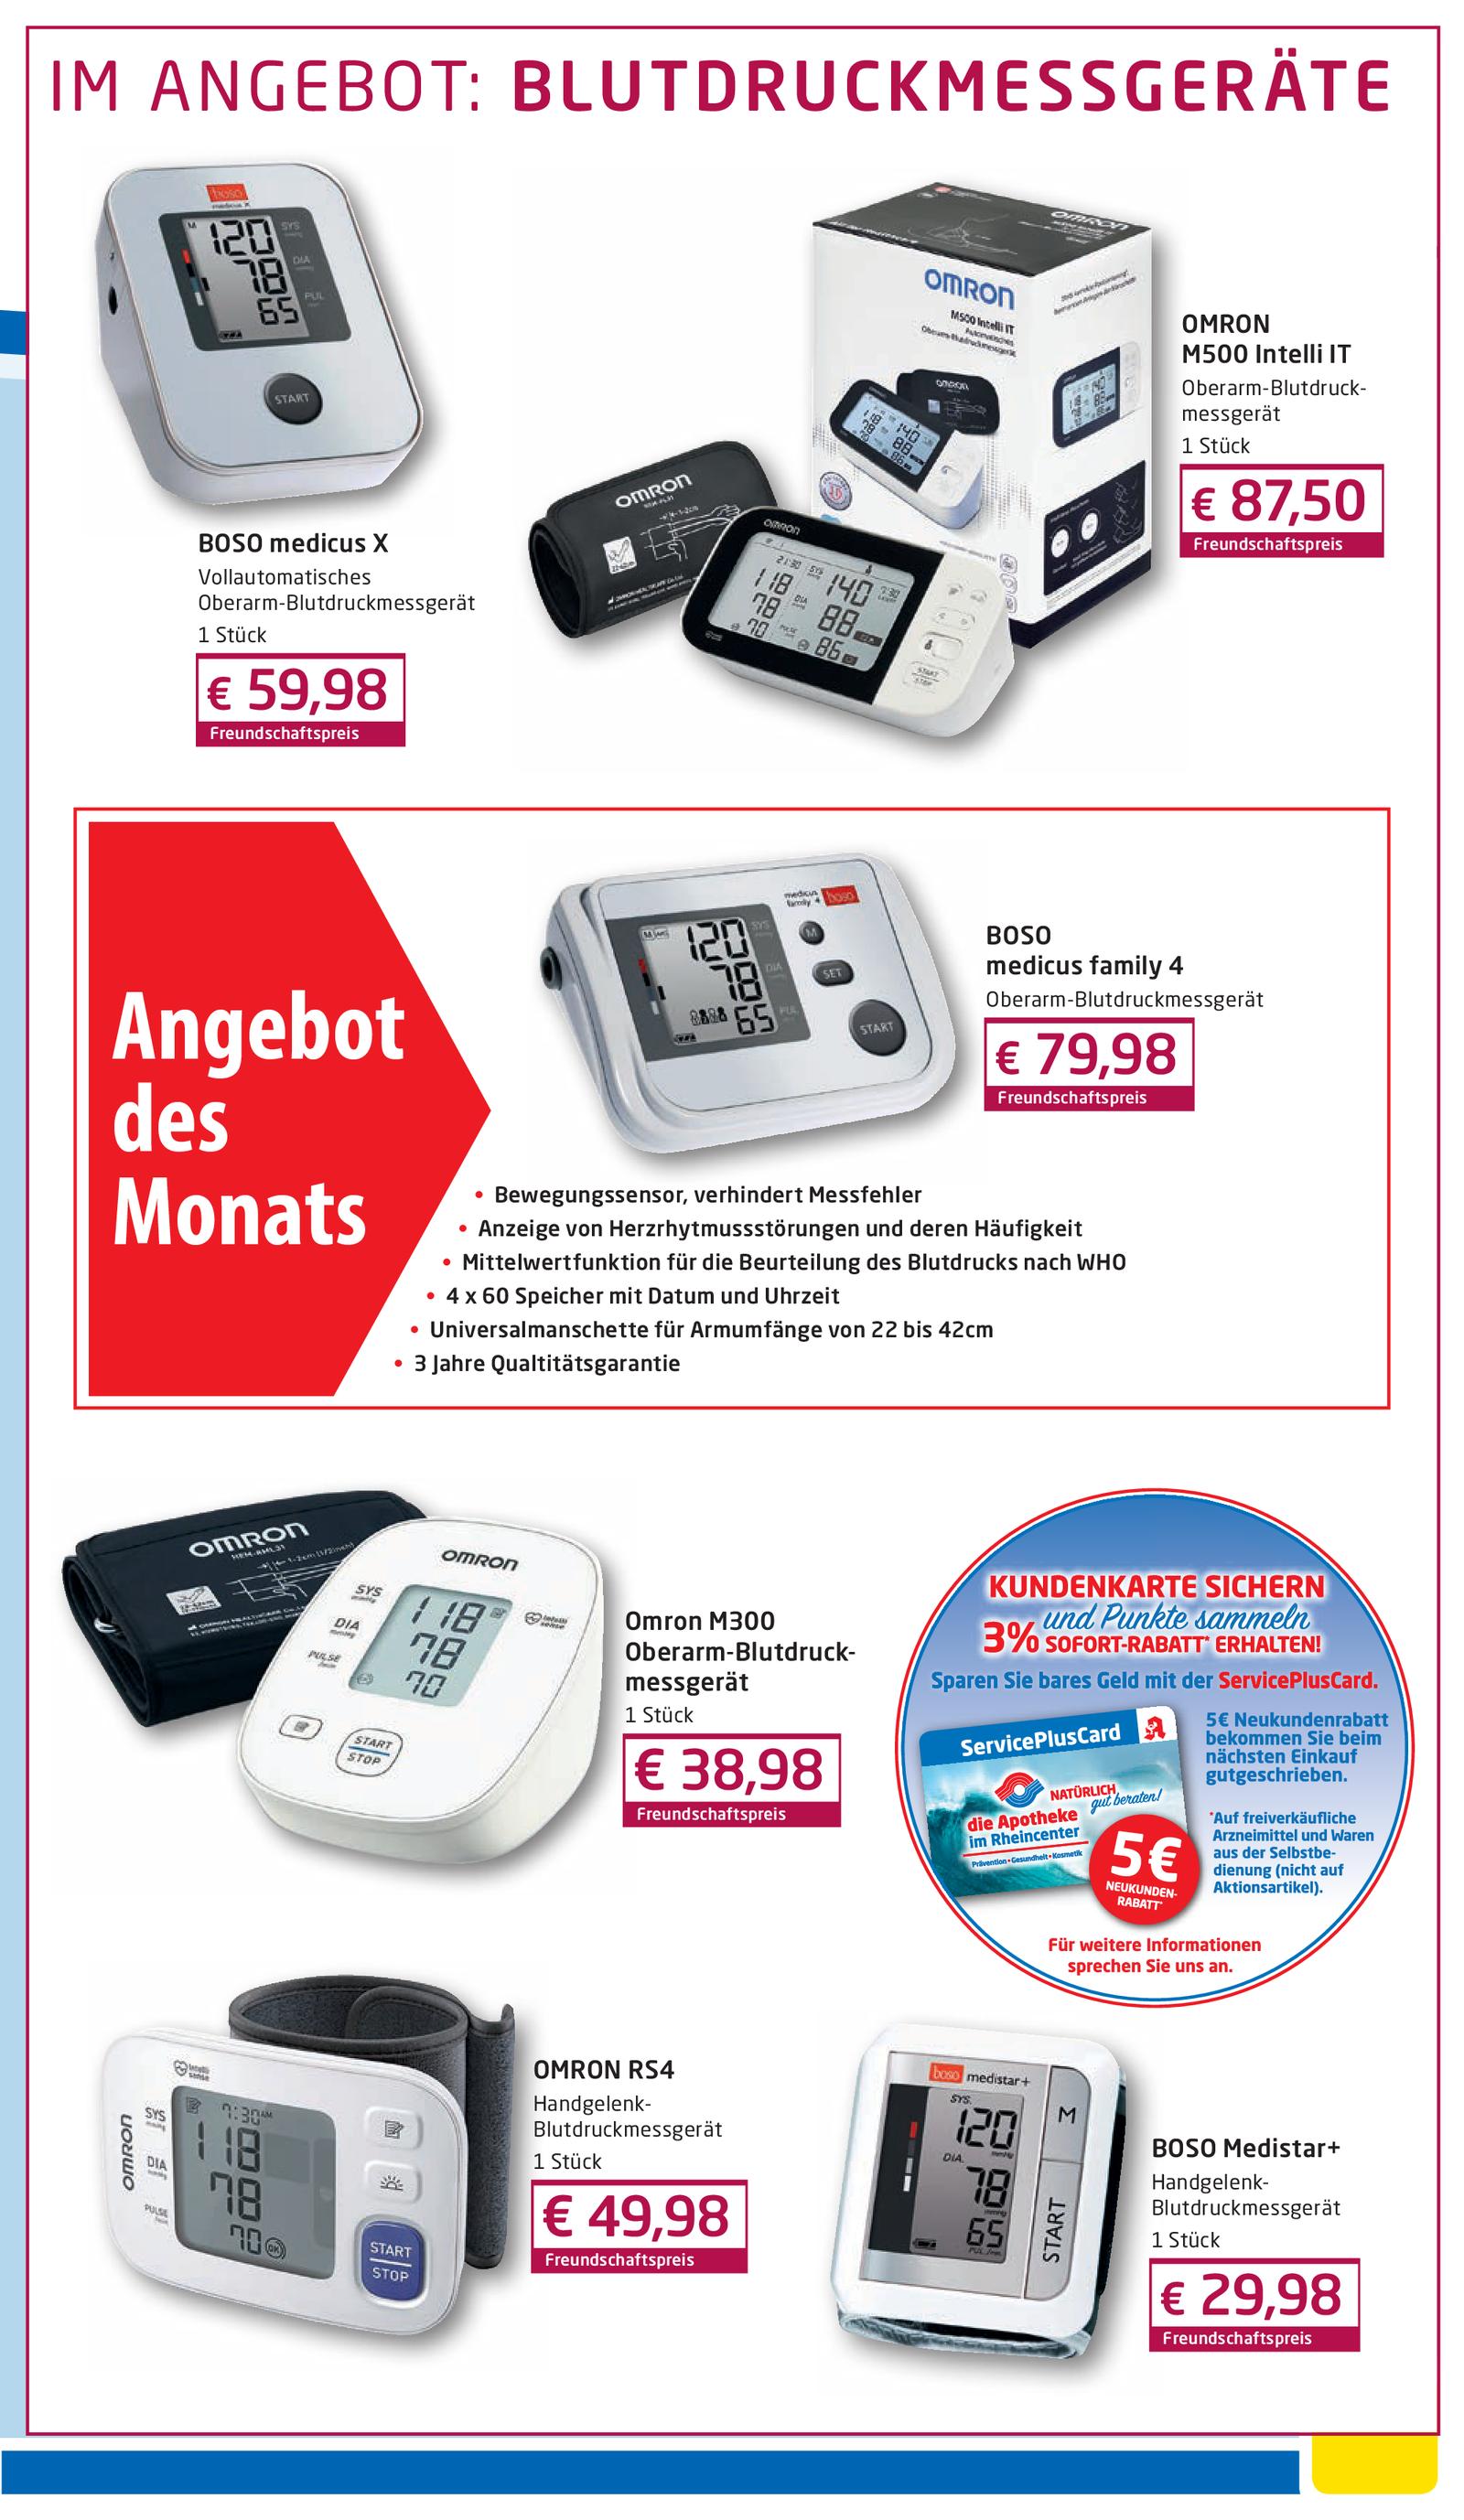 https://mein-uploads.apocdn.net/10275/leaflets/10275_flyer-Seite3.png